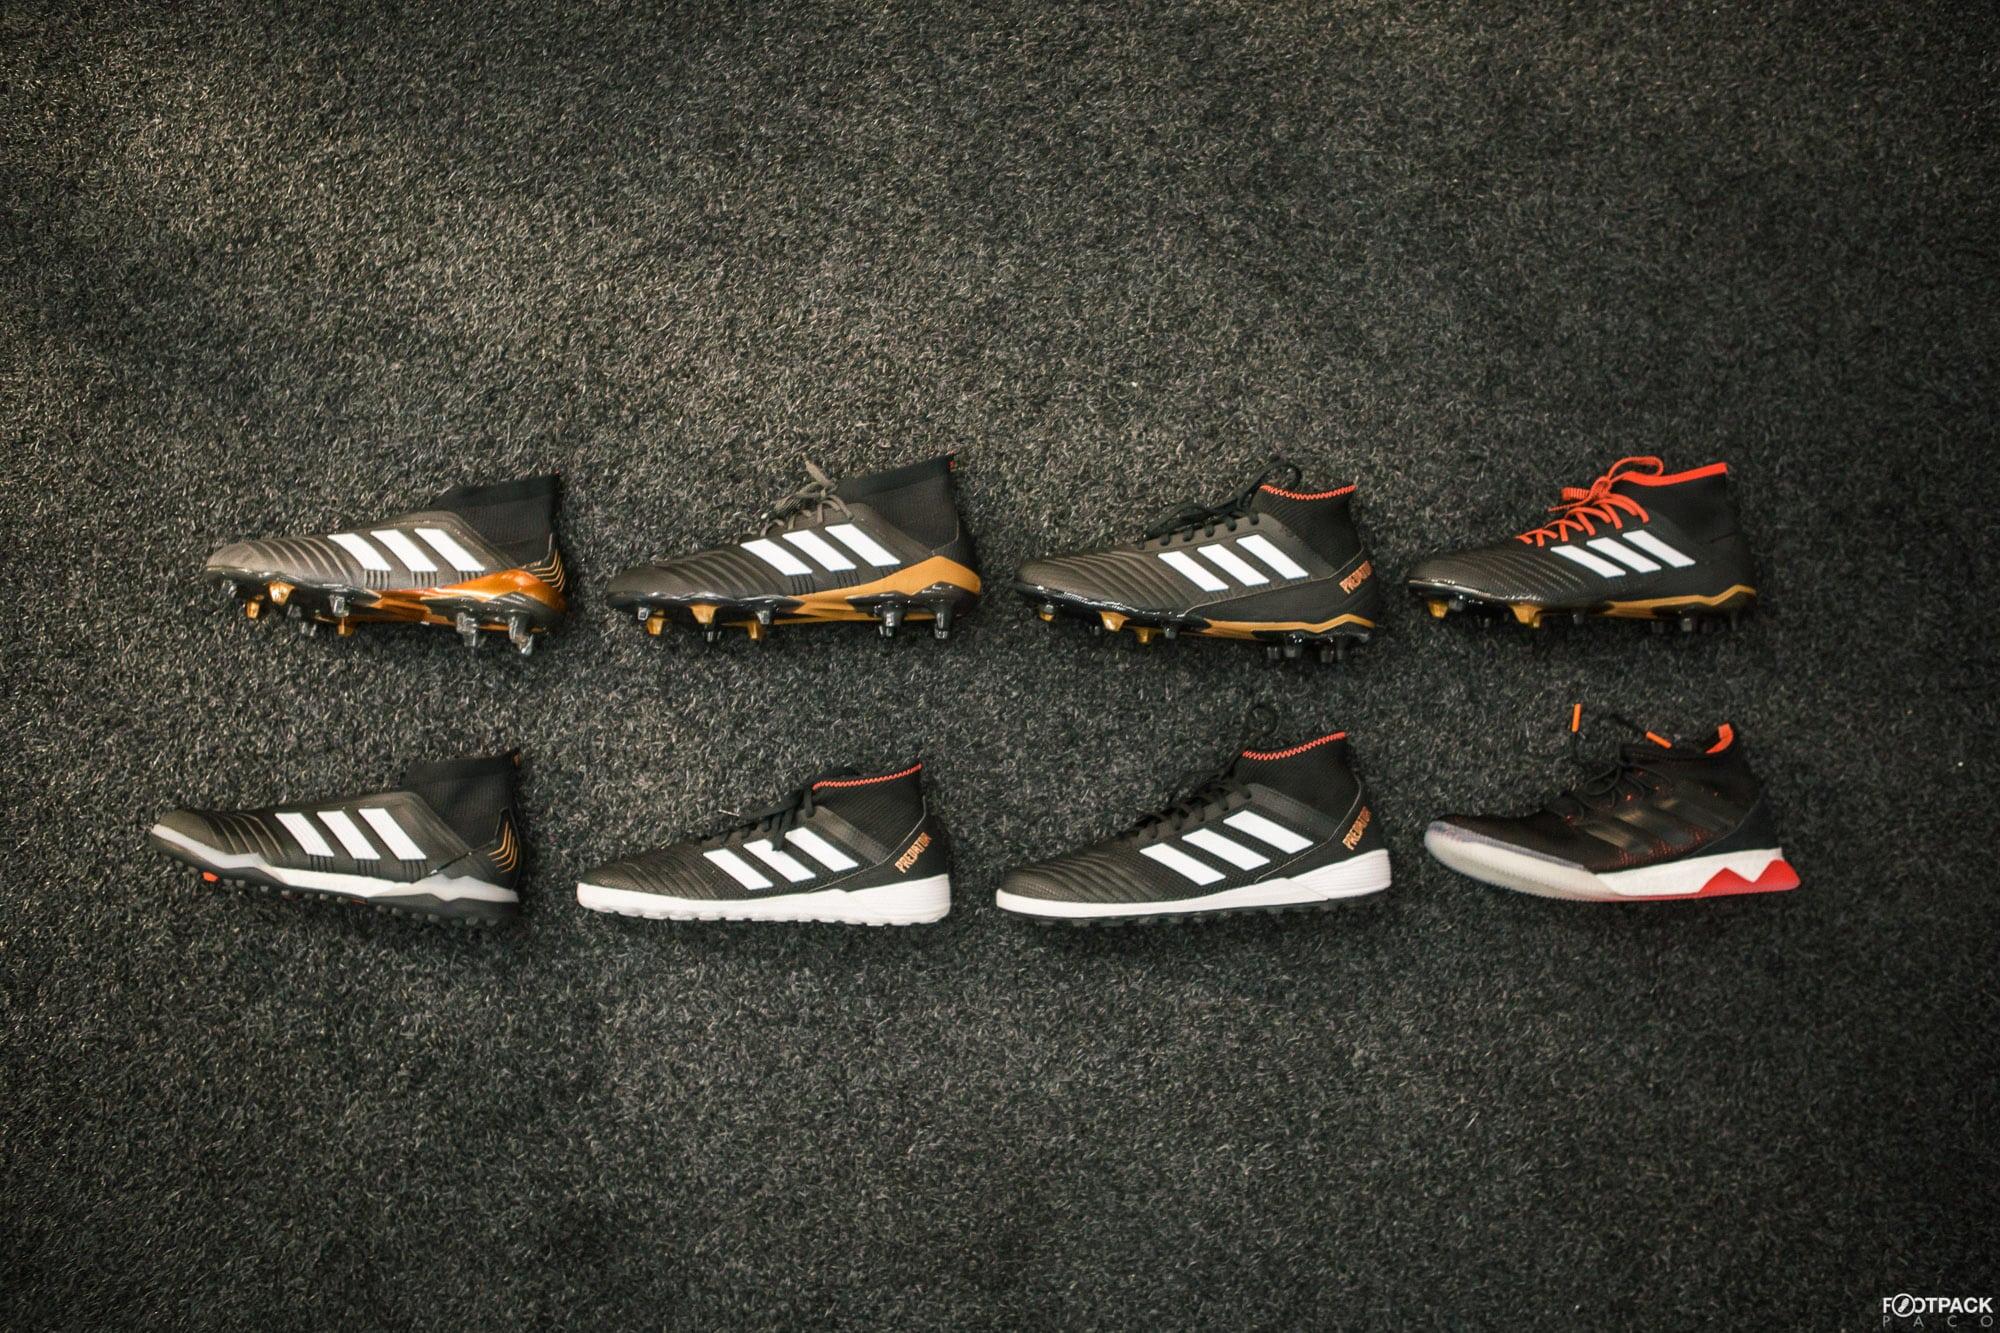 chaussures-football-adidas-Predator-18-gamme-img2